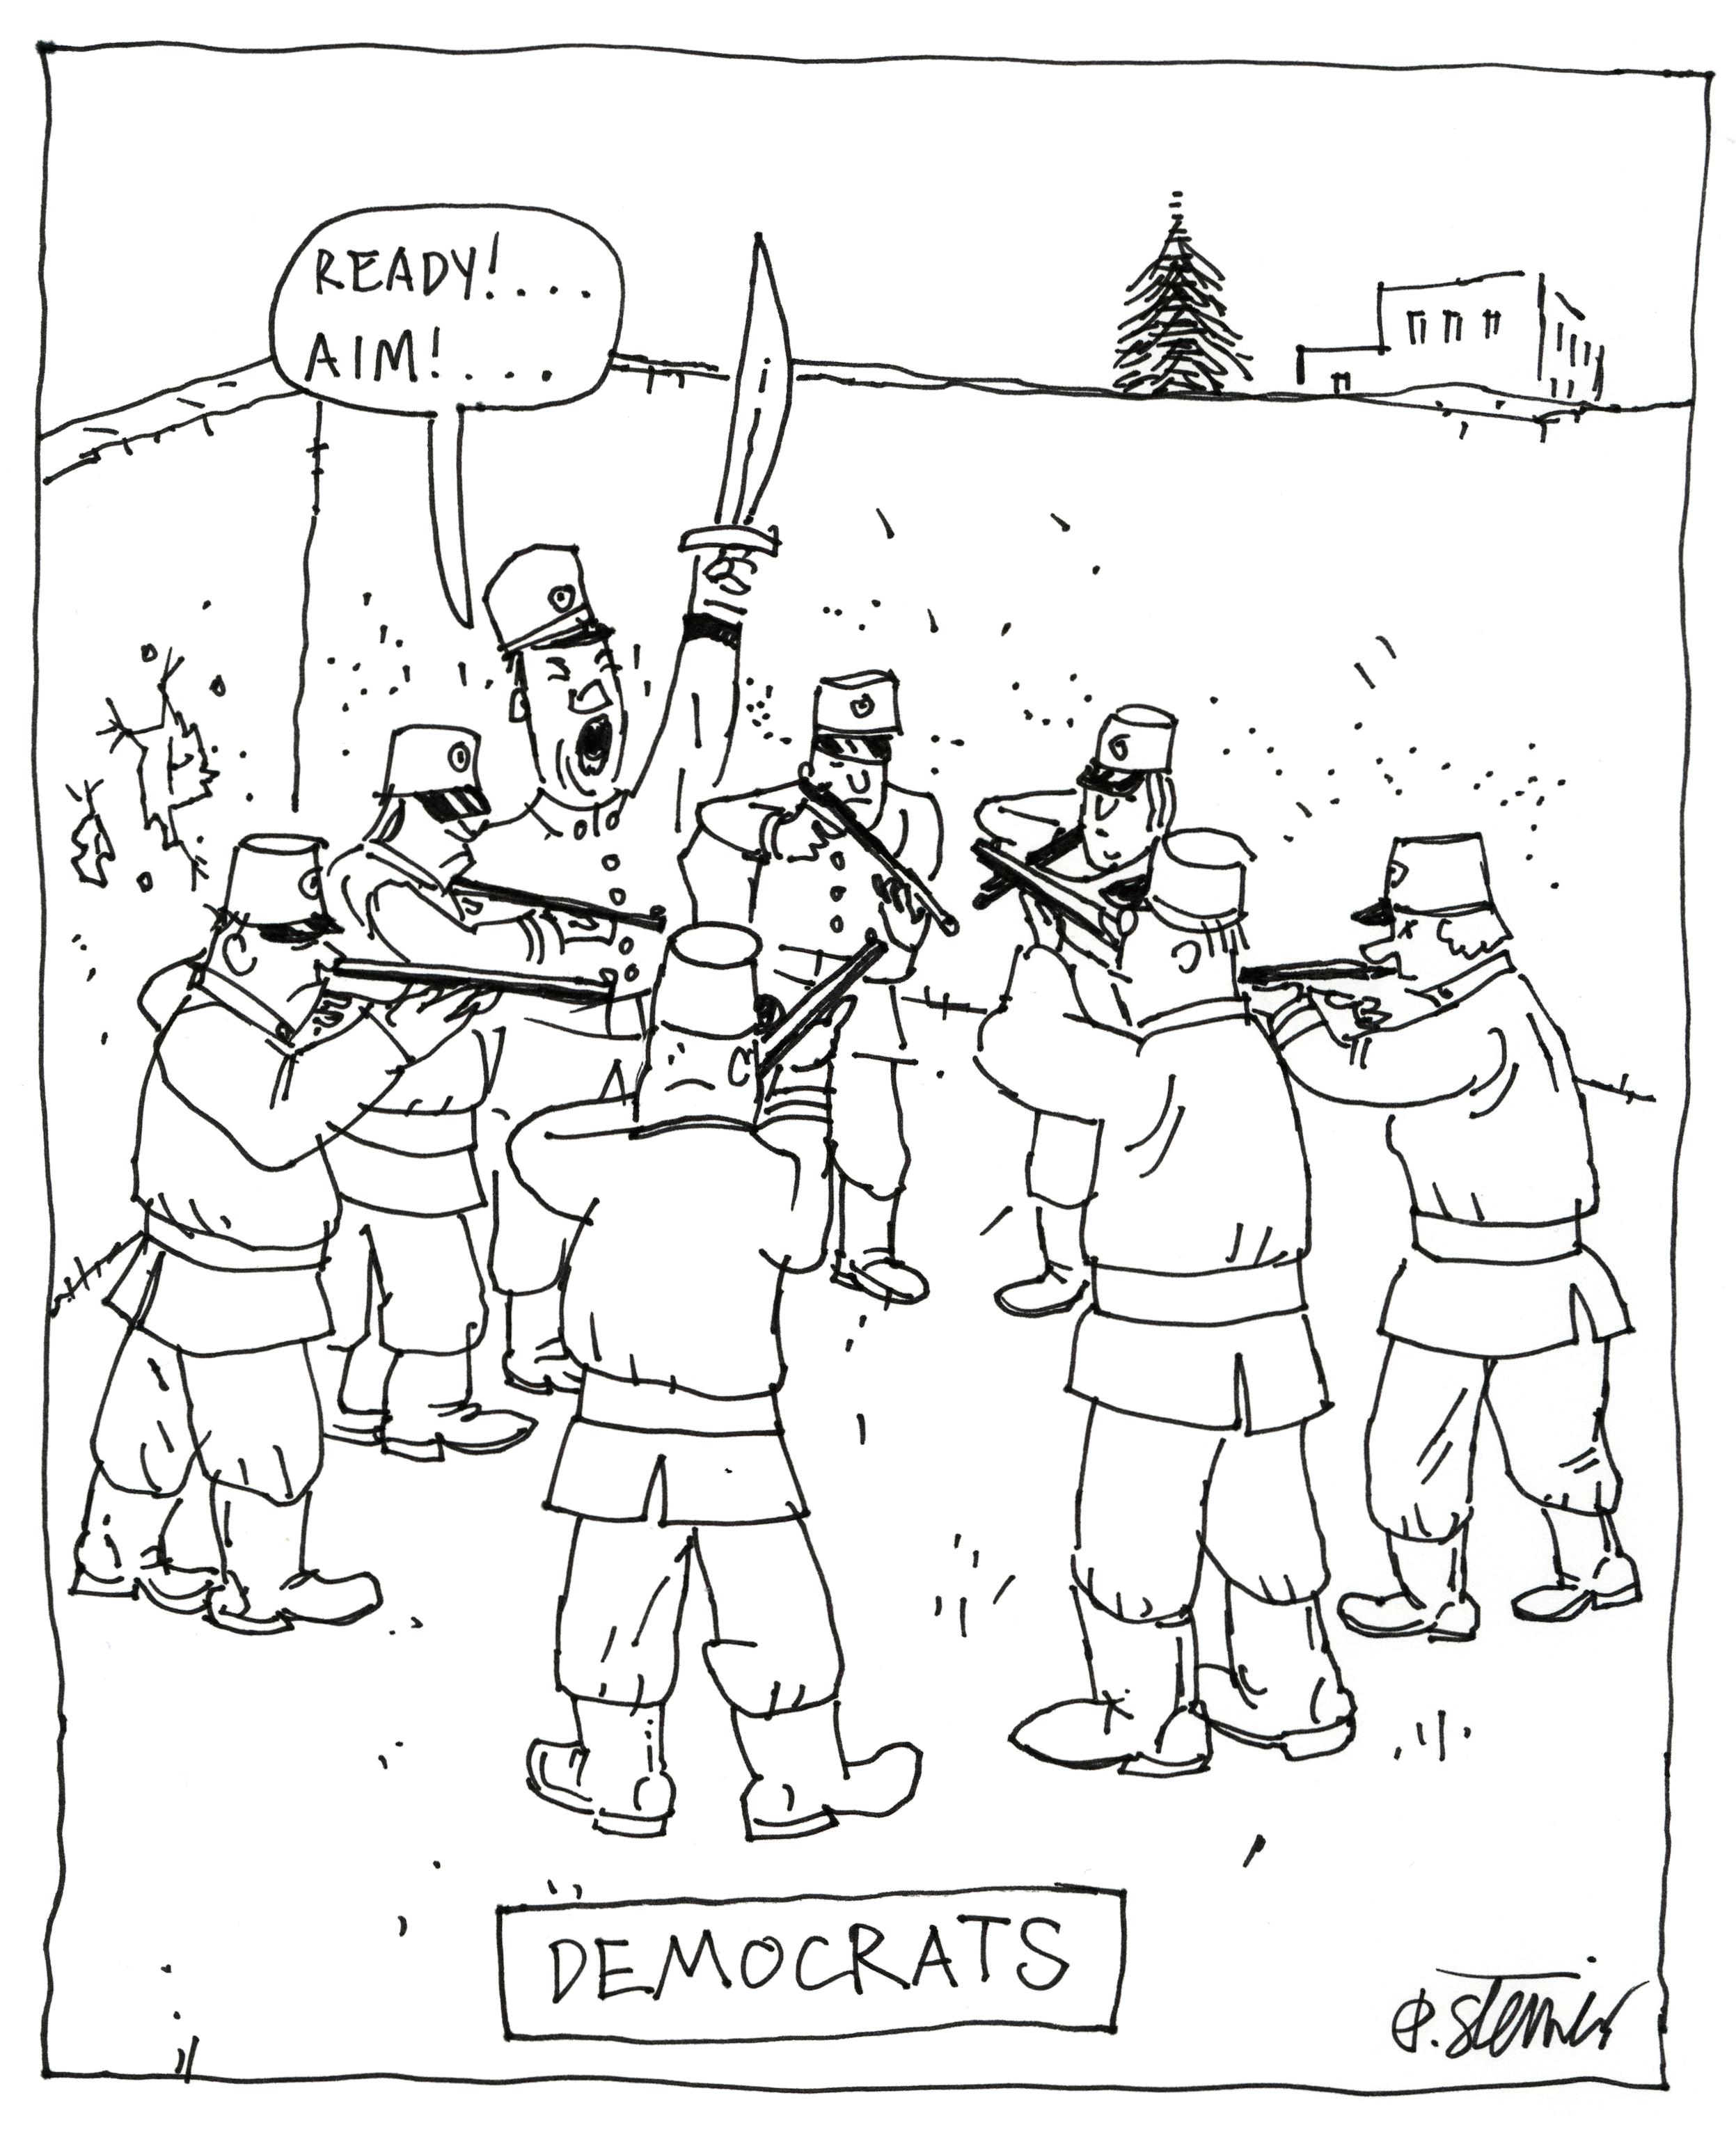 2019-8-3 Circular firing squad.jpg